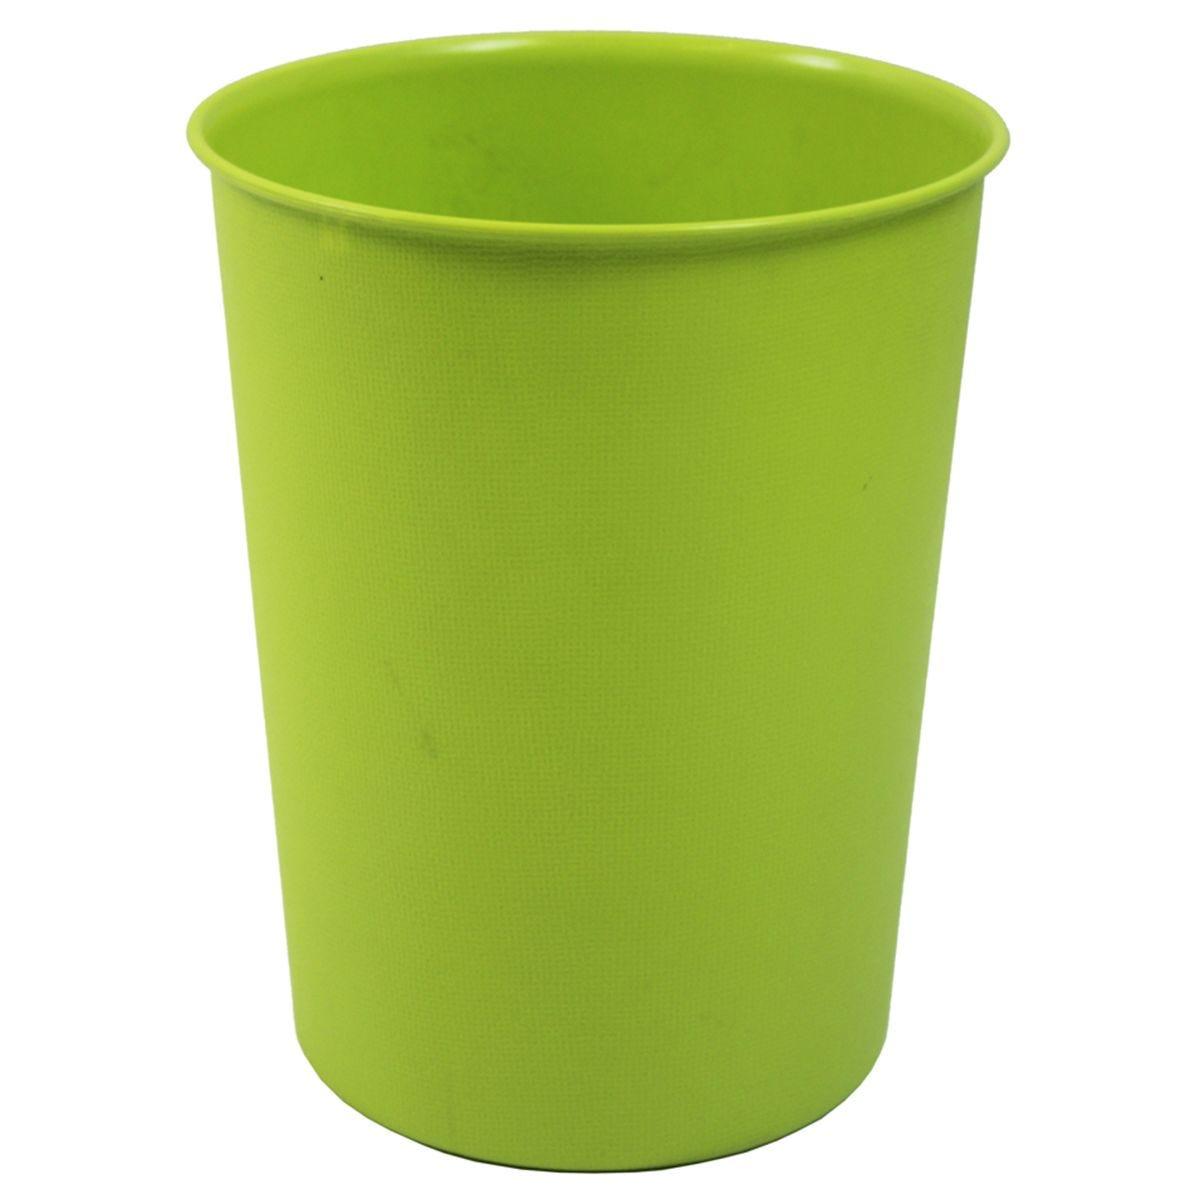 JVL Quality Vibrance Lightweight Waste Paper Basket Bin Plastic Bright Green